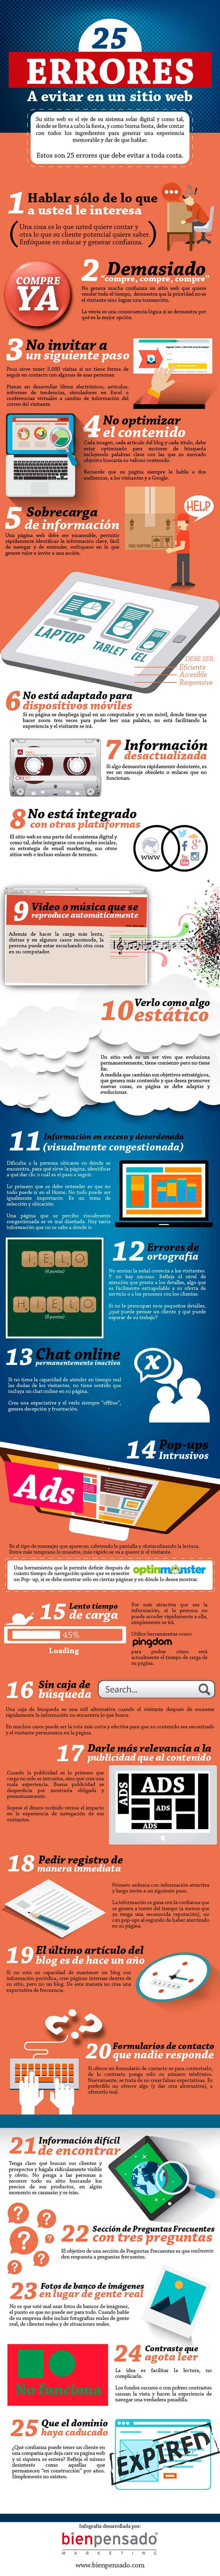 Infografia sobre los 25 errores a evitar en una web